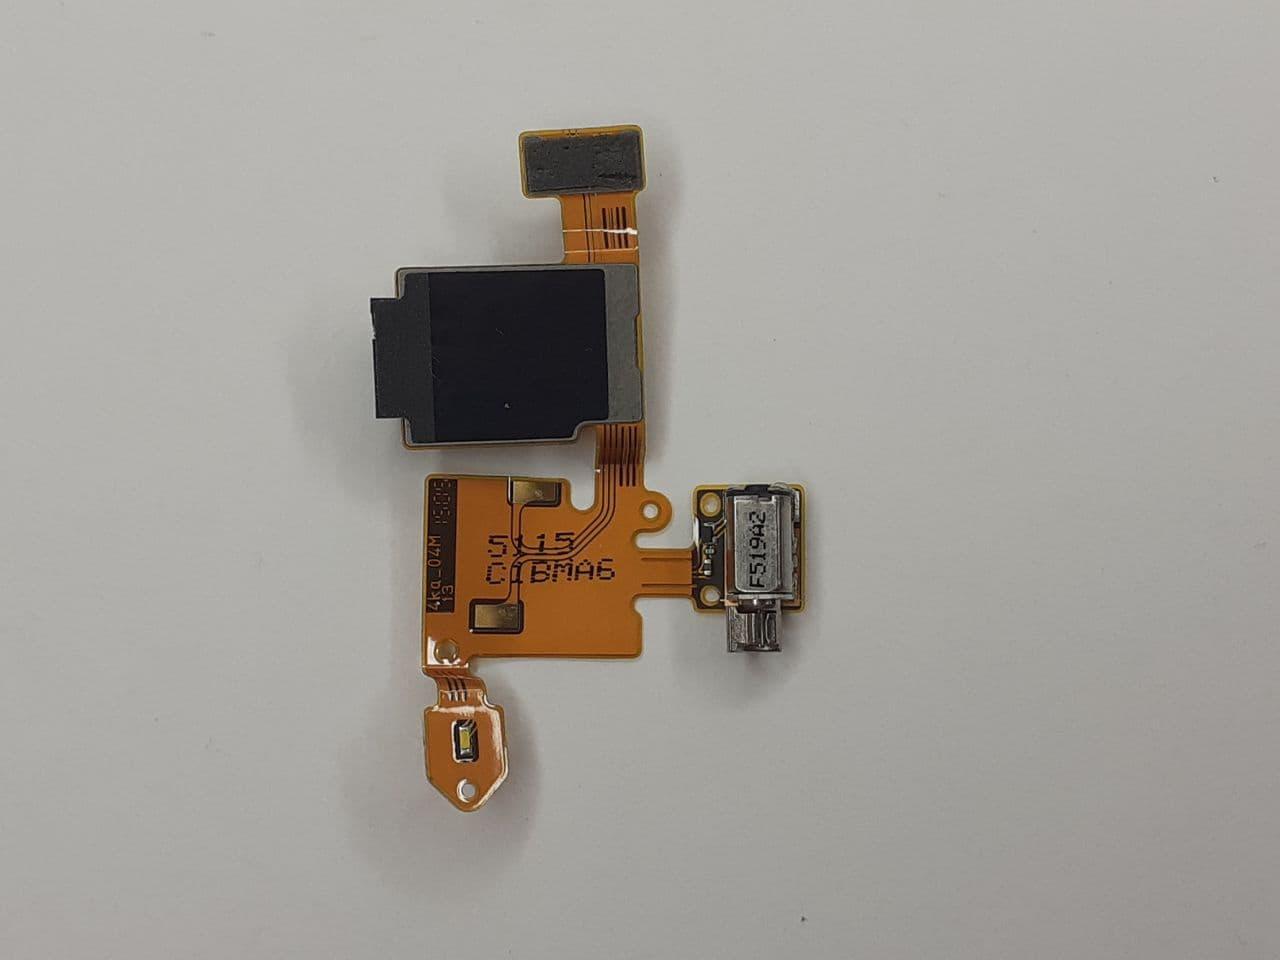 Шлейф Nokia 730 Dual/735 (RM-1040/RM-1038) вибро/аудио разъем оригинал б.у.